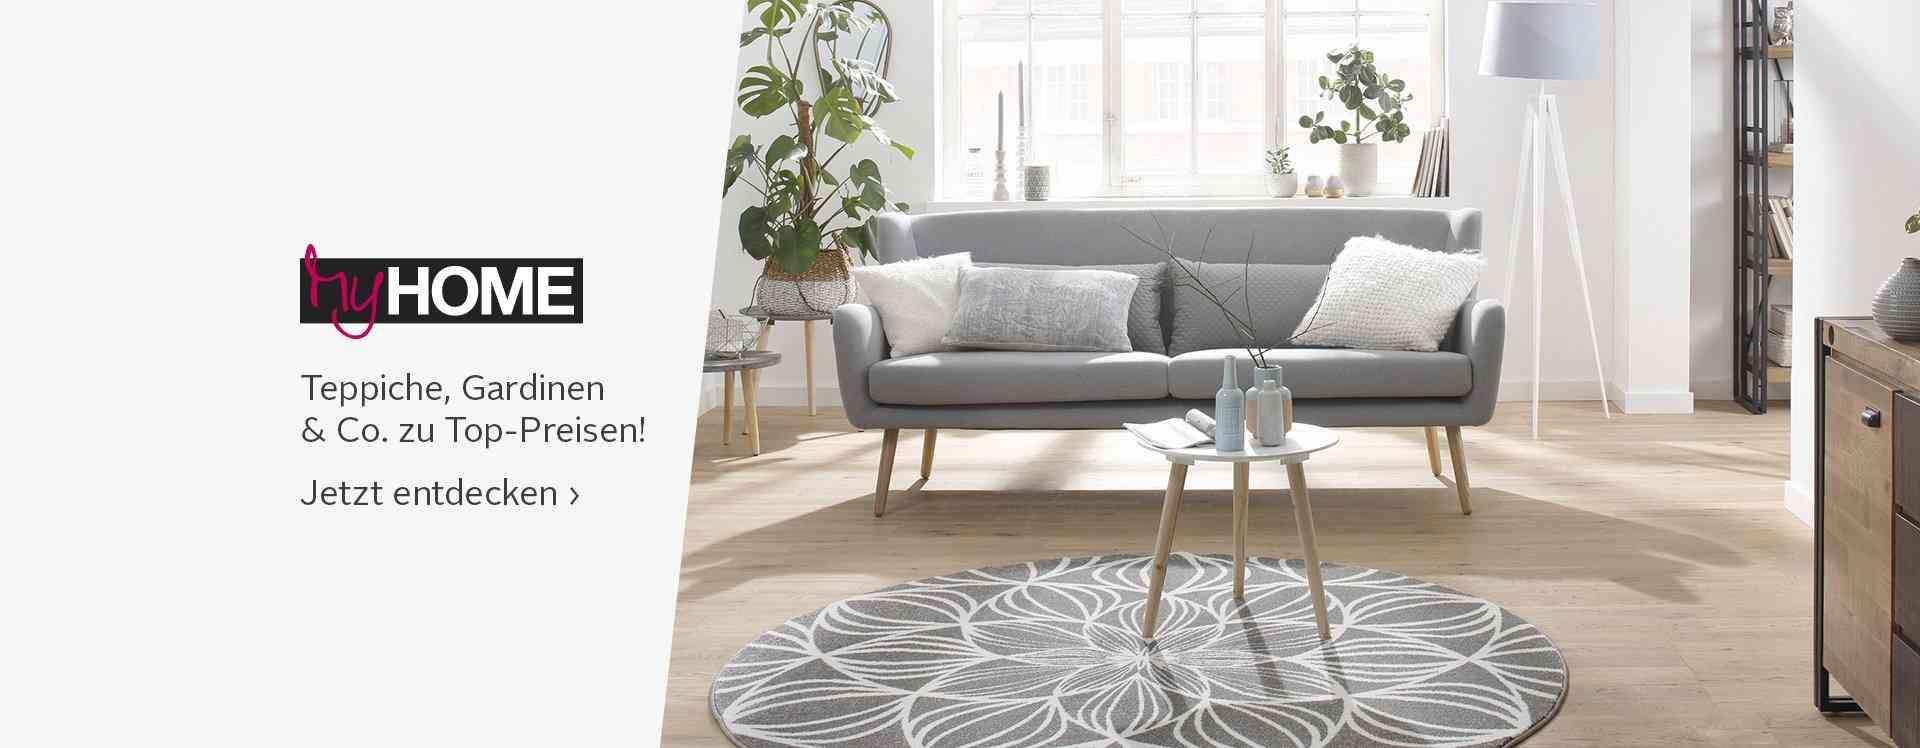 heimtextilien marken otto. Black Bedroom Furniture Sets. Home Design Ideas